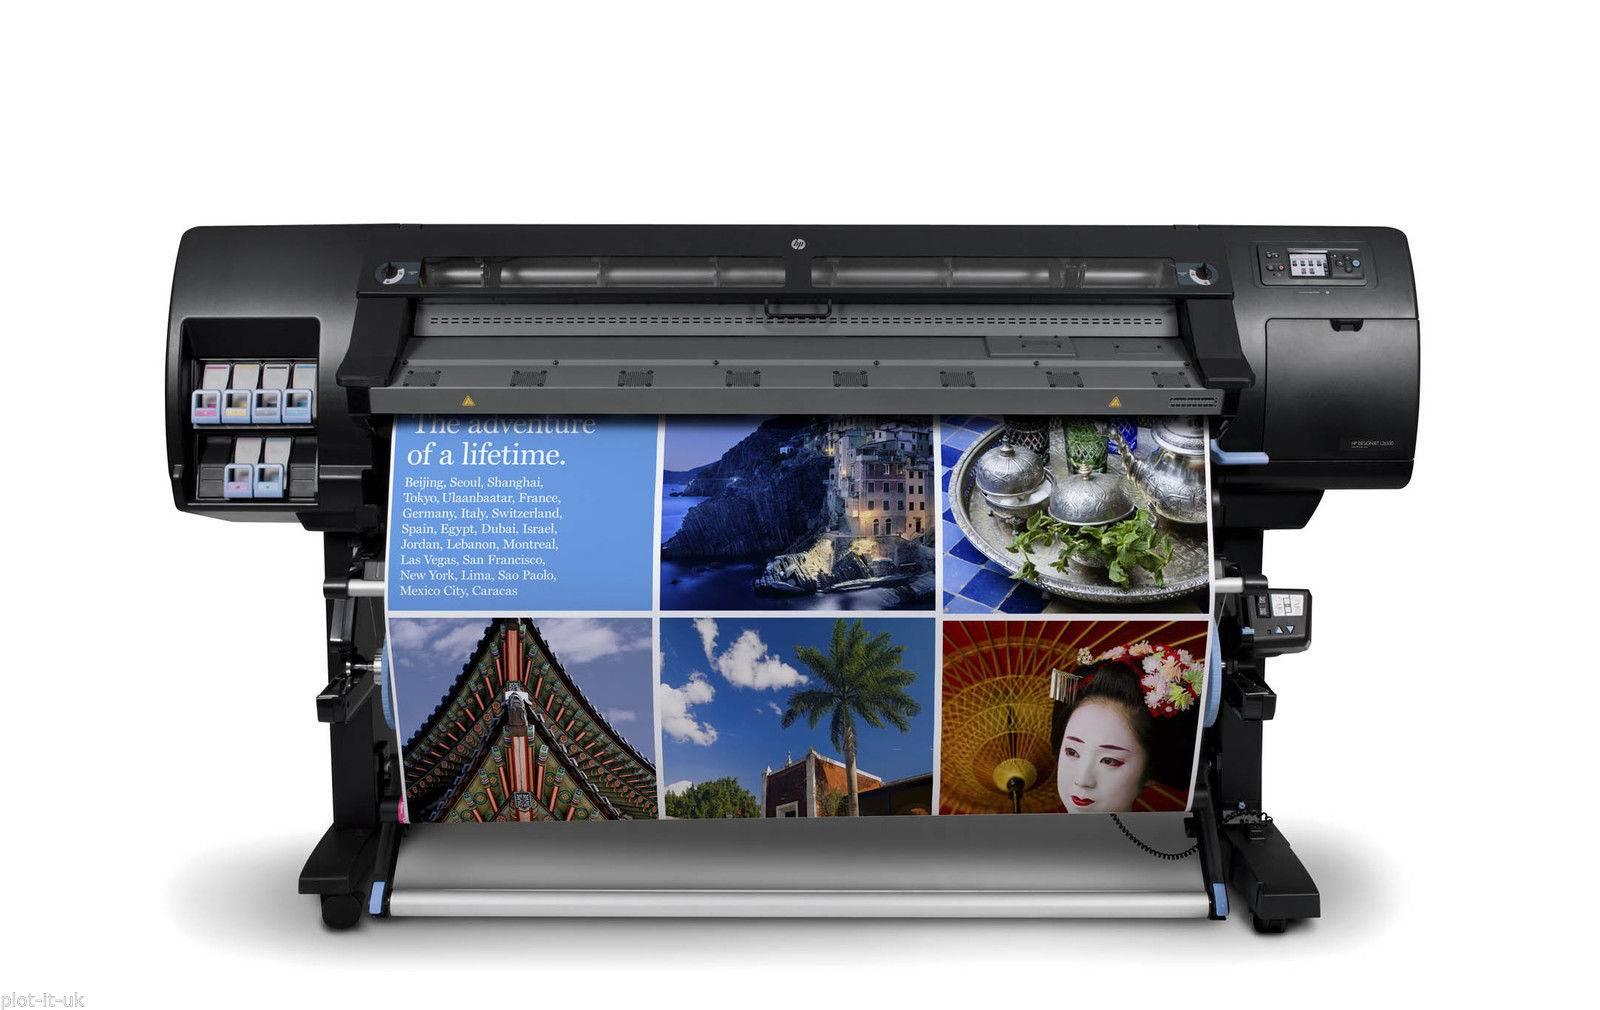 HP Designjet L26500 Wide Format Latex Printer